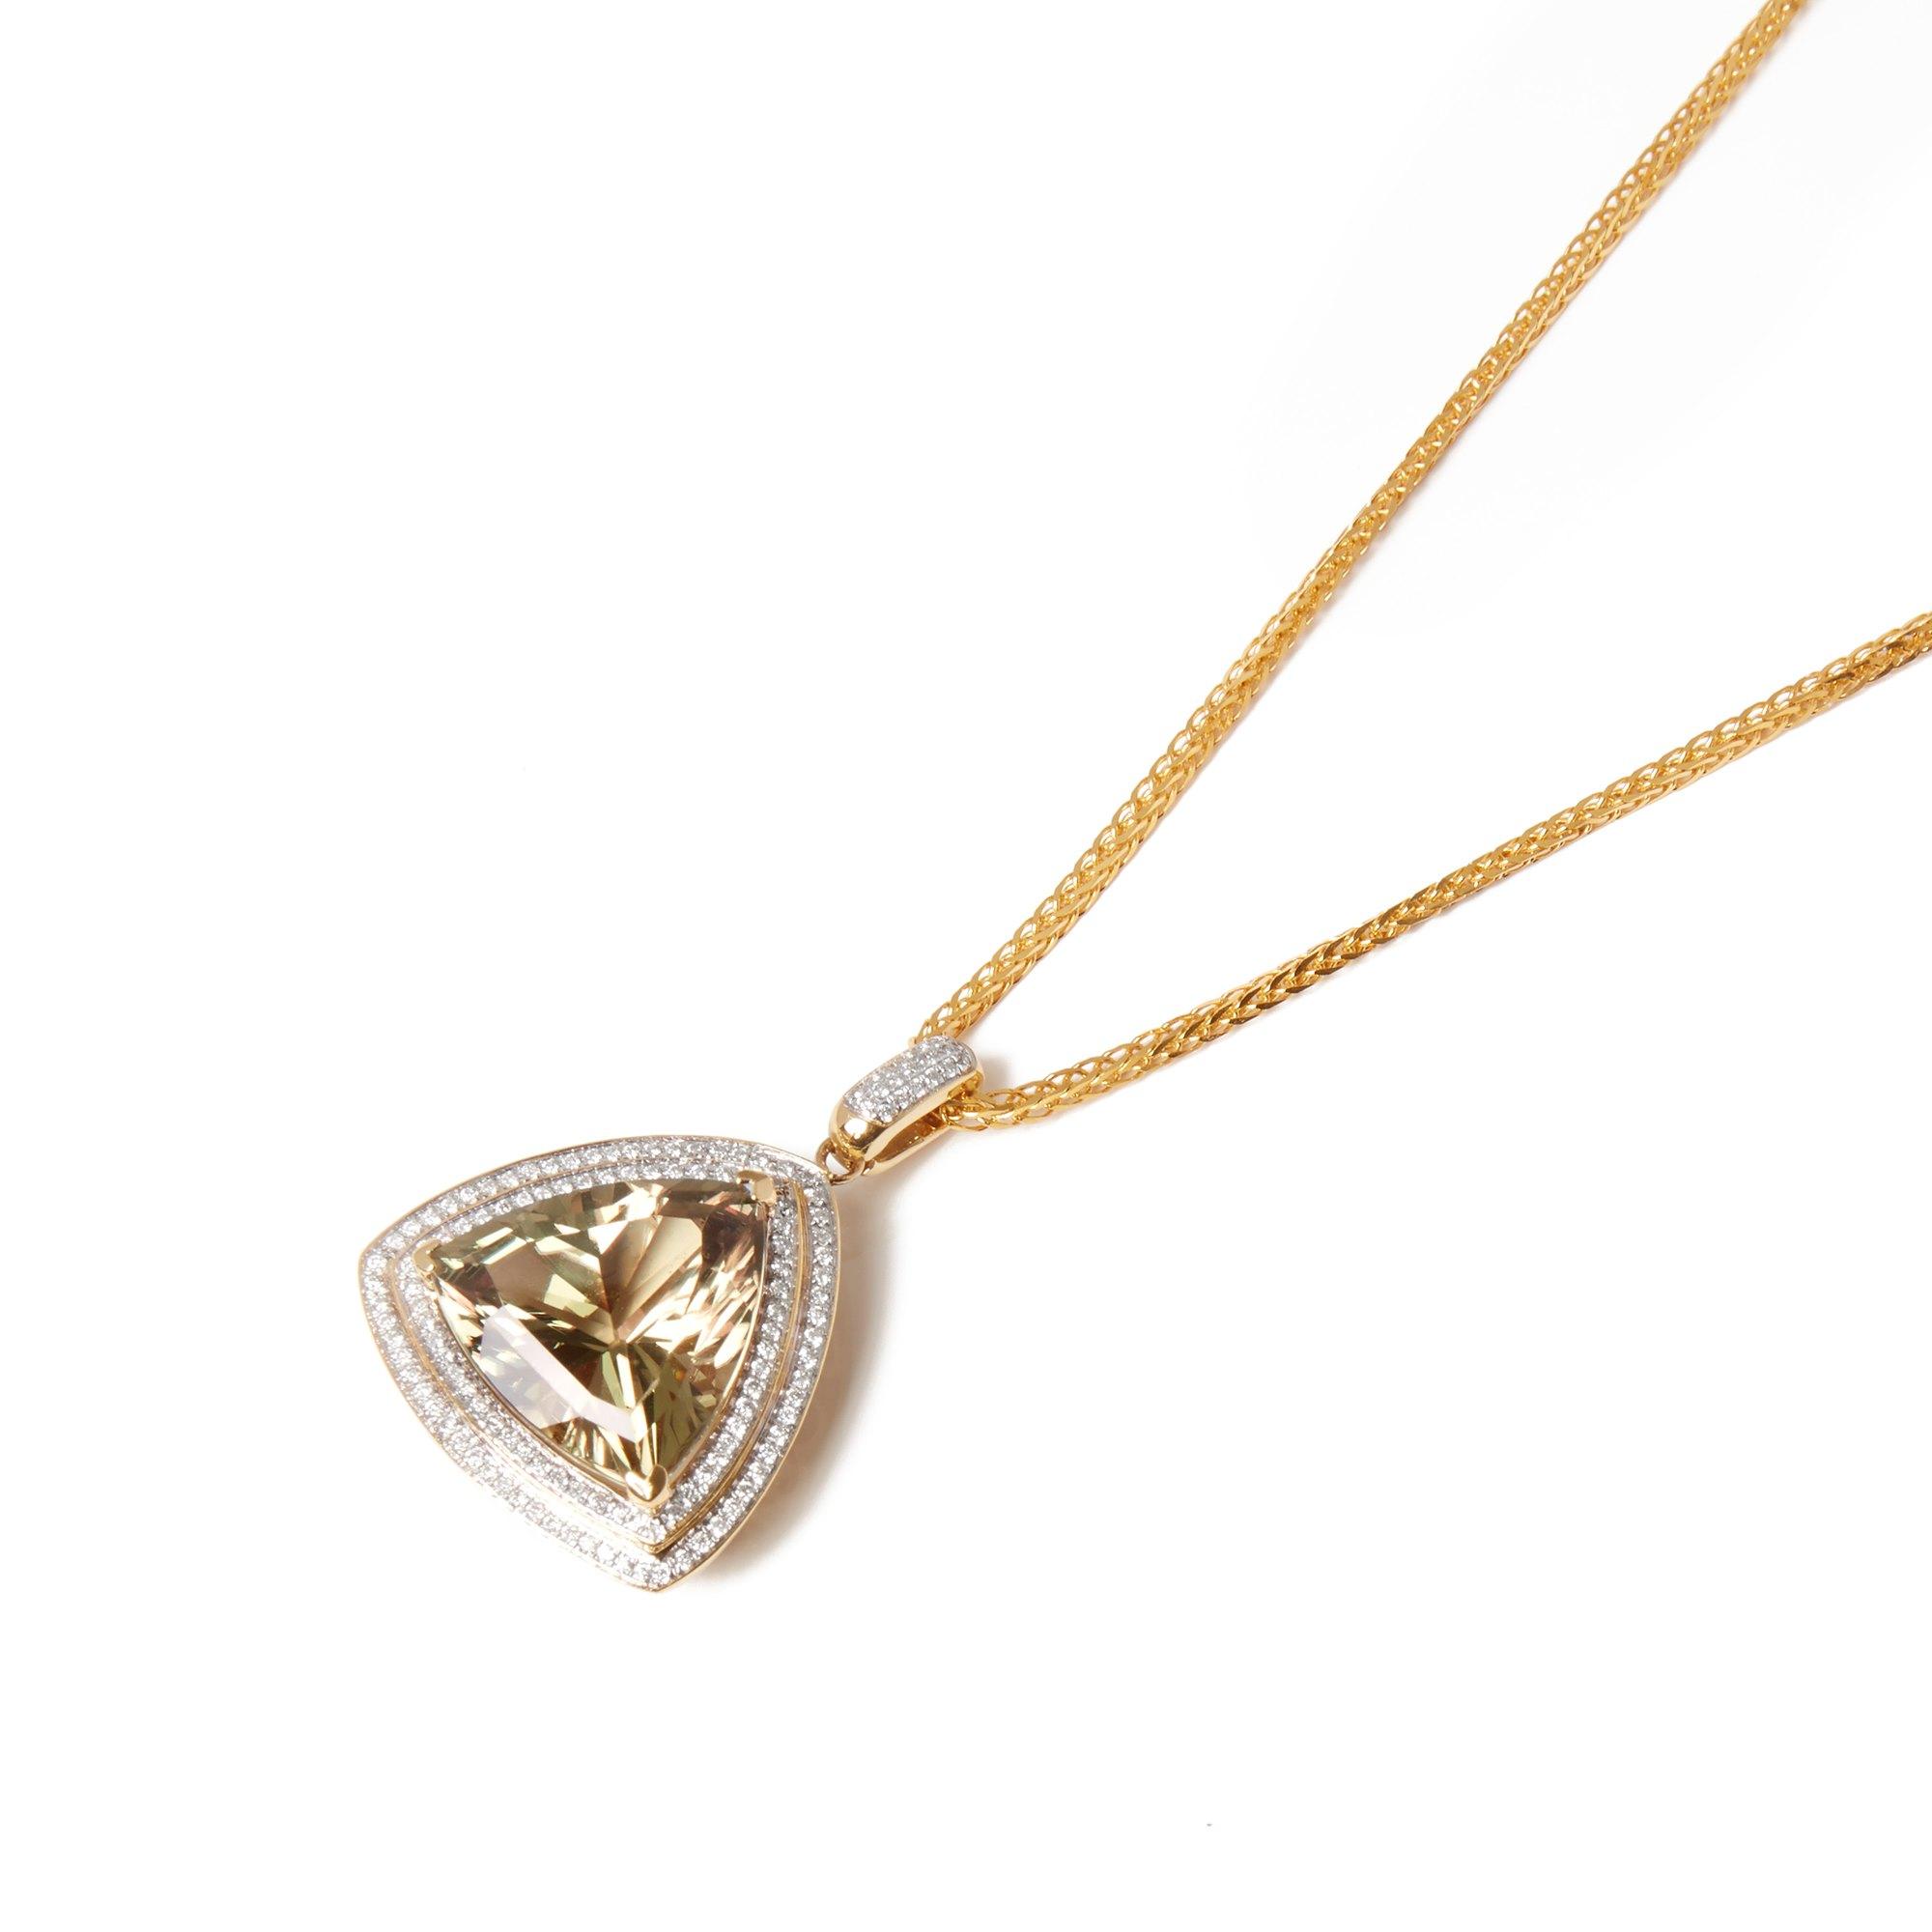 David Jerome 18k Yellow Gold Zultanite and Diamond Pendant